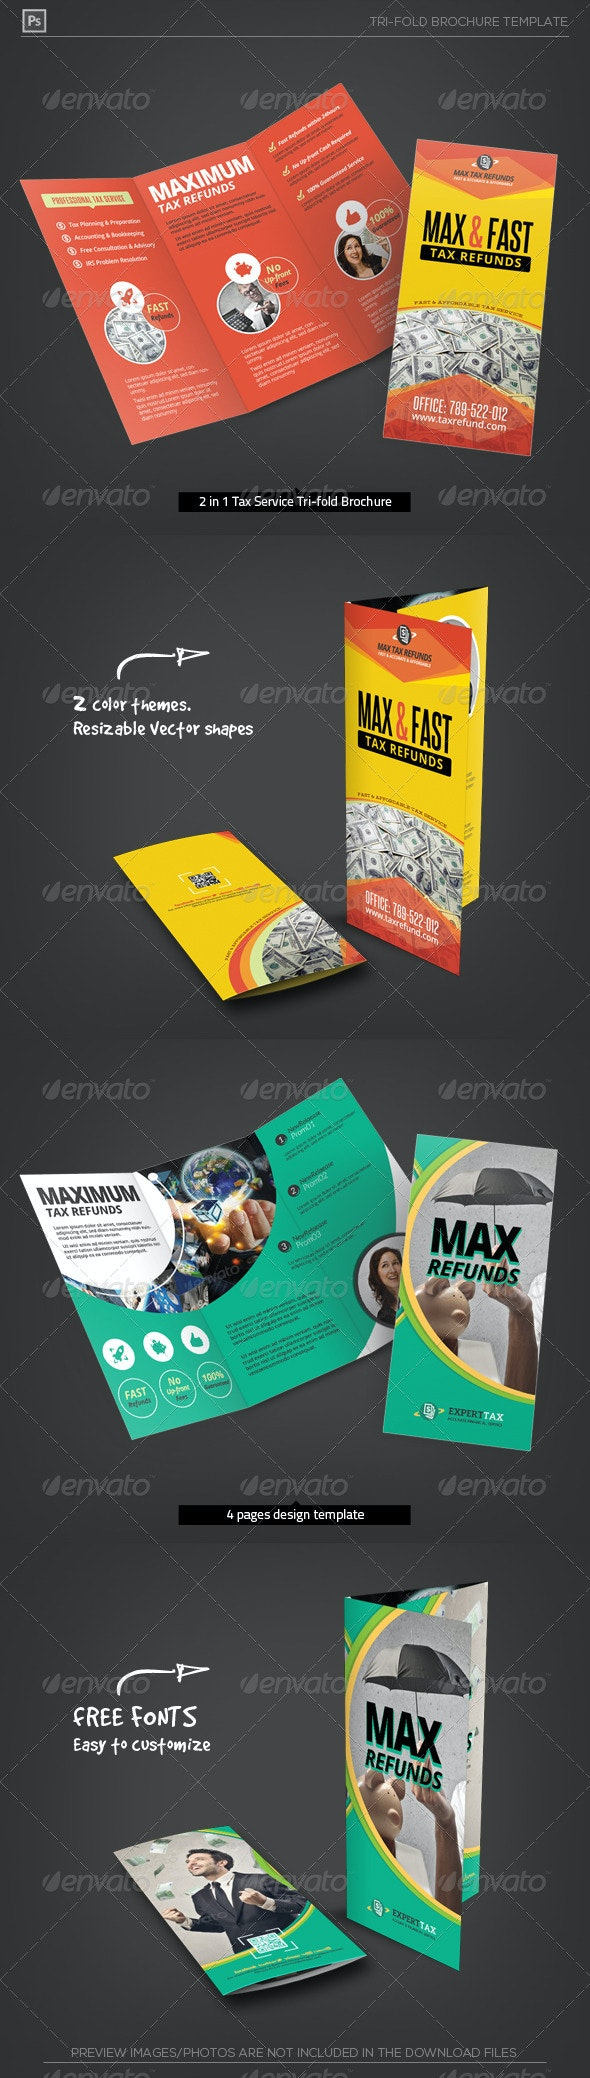 Business Tax Refund Service Tri-Fold Brochure - Corporate Brochures